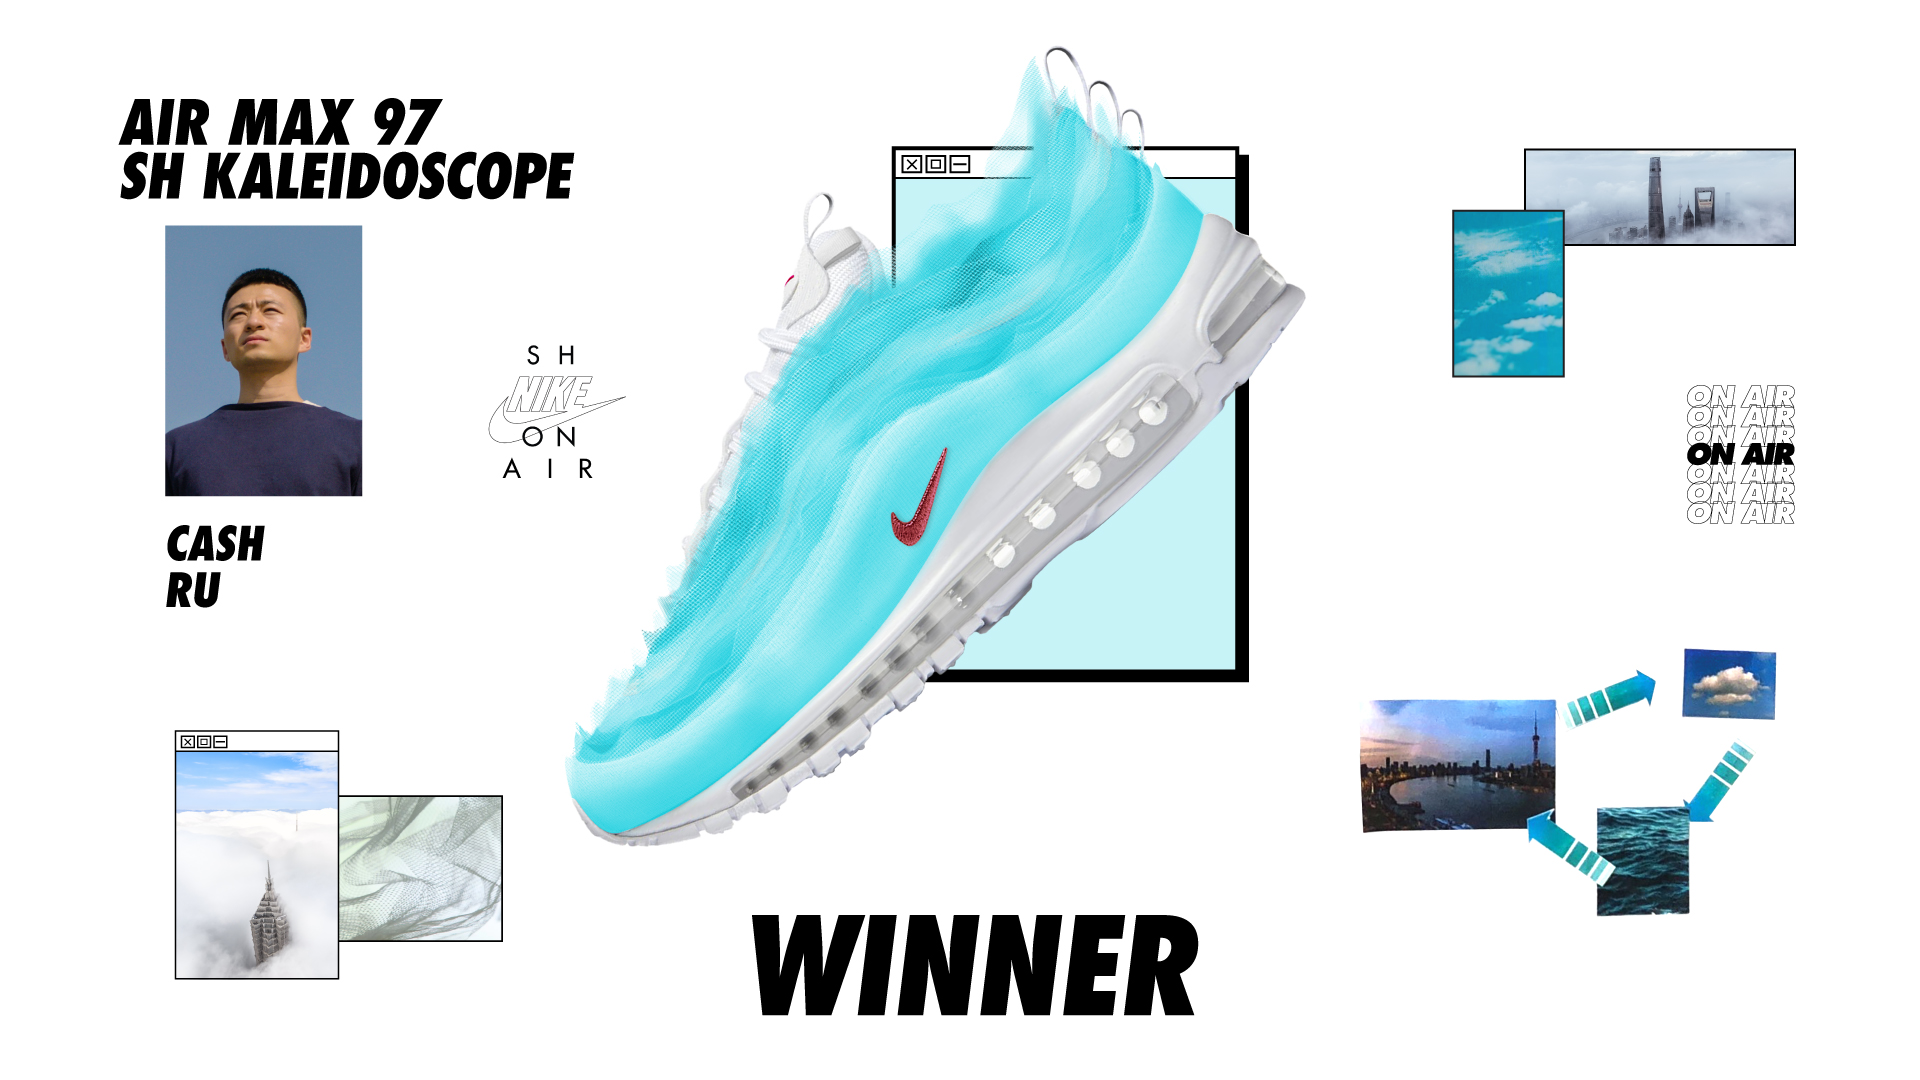 nike on air winners air max 97 sh kaleidoscope cash ru